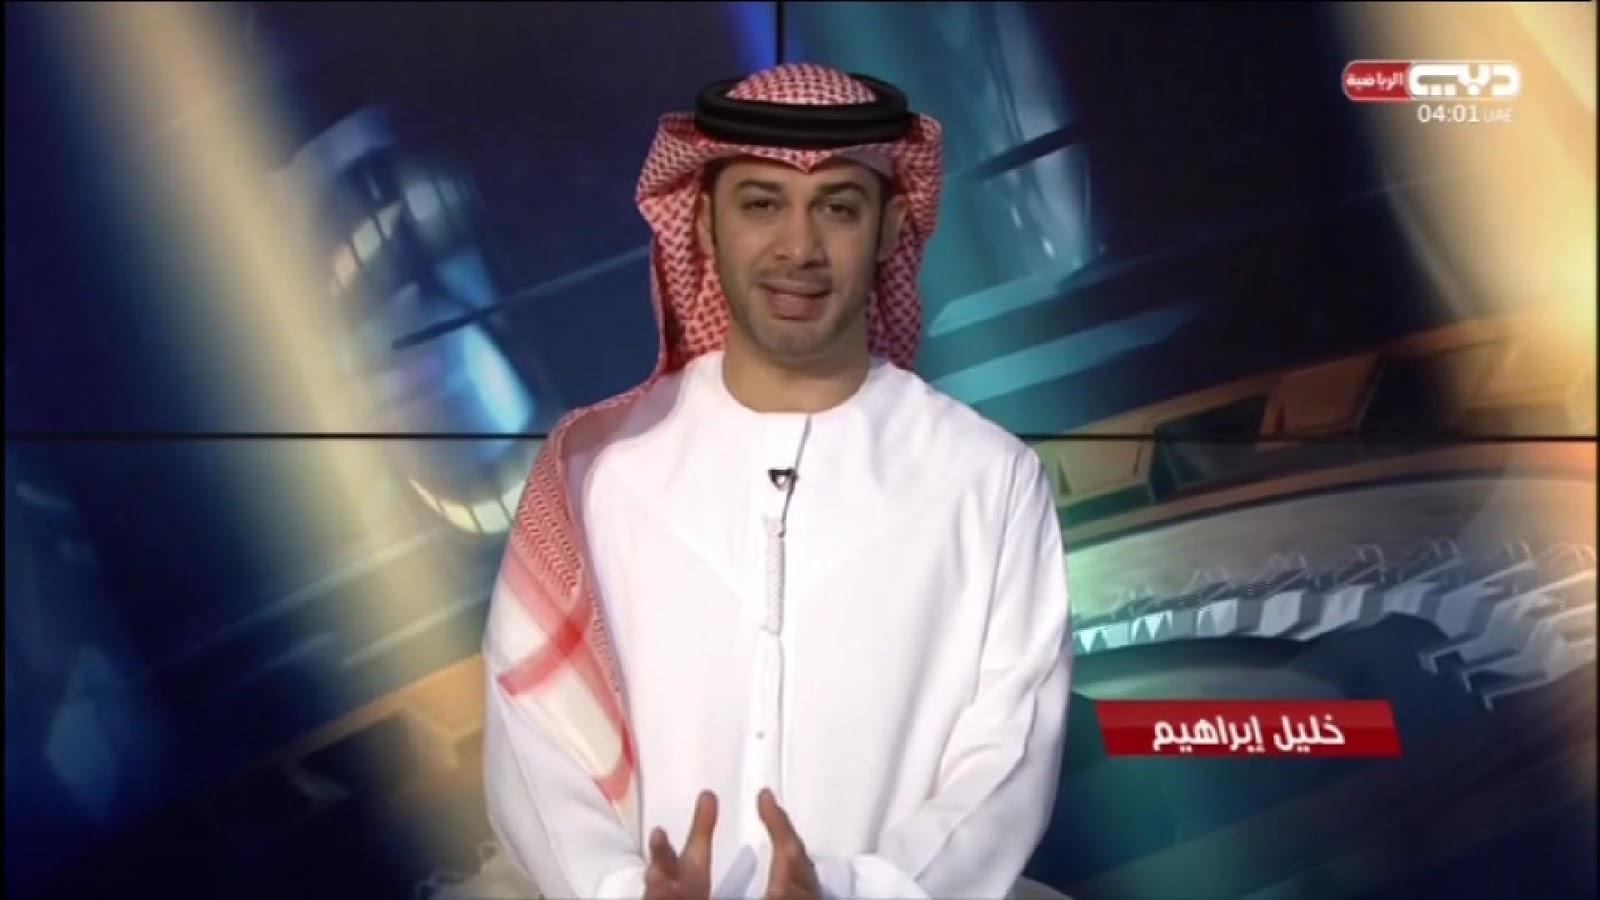 Frekuensi siaran Dubai Sports 3 di satelit Palapa D Terbaru